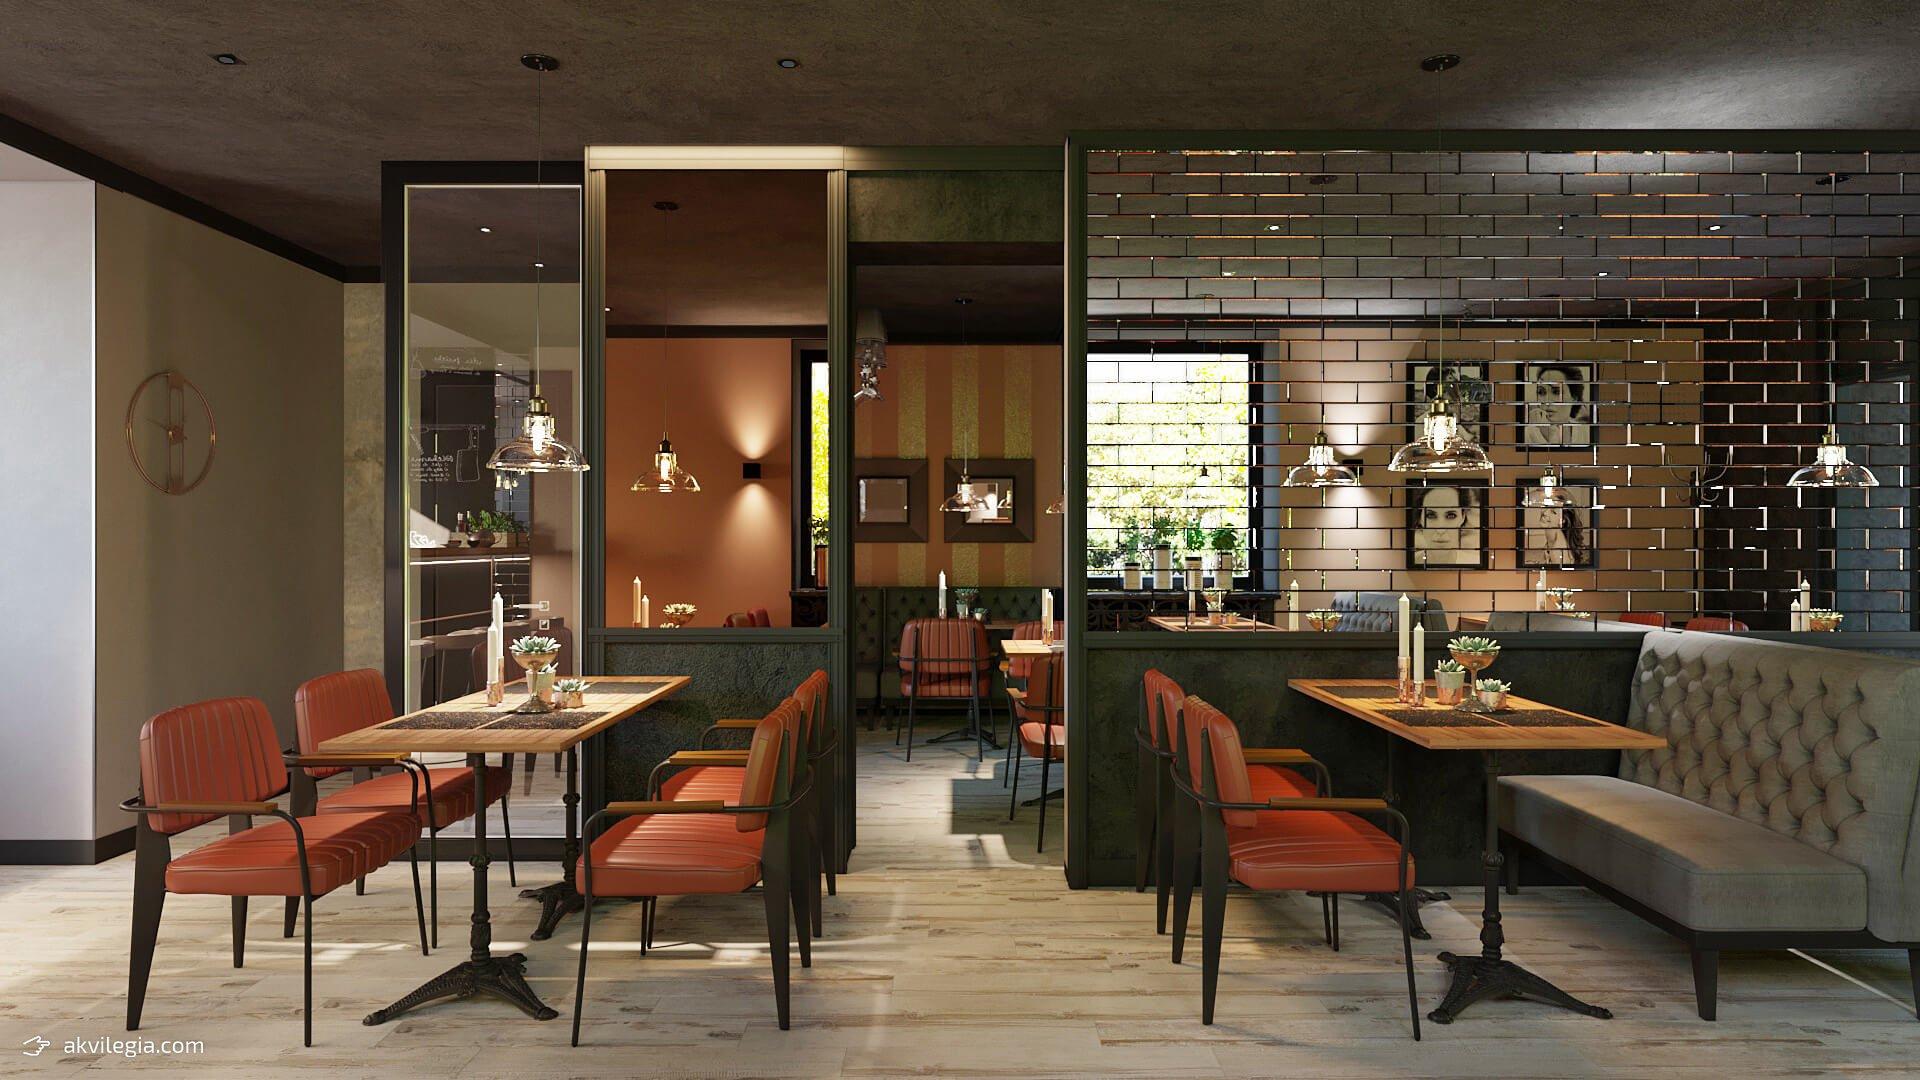 дизайн проект экстерьера кафе-бара